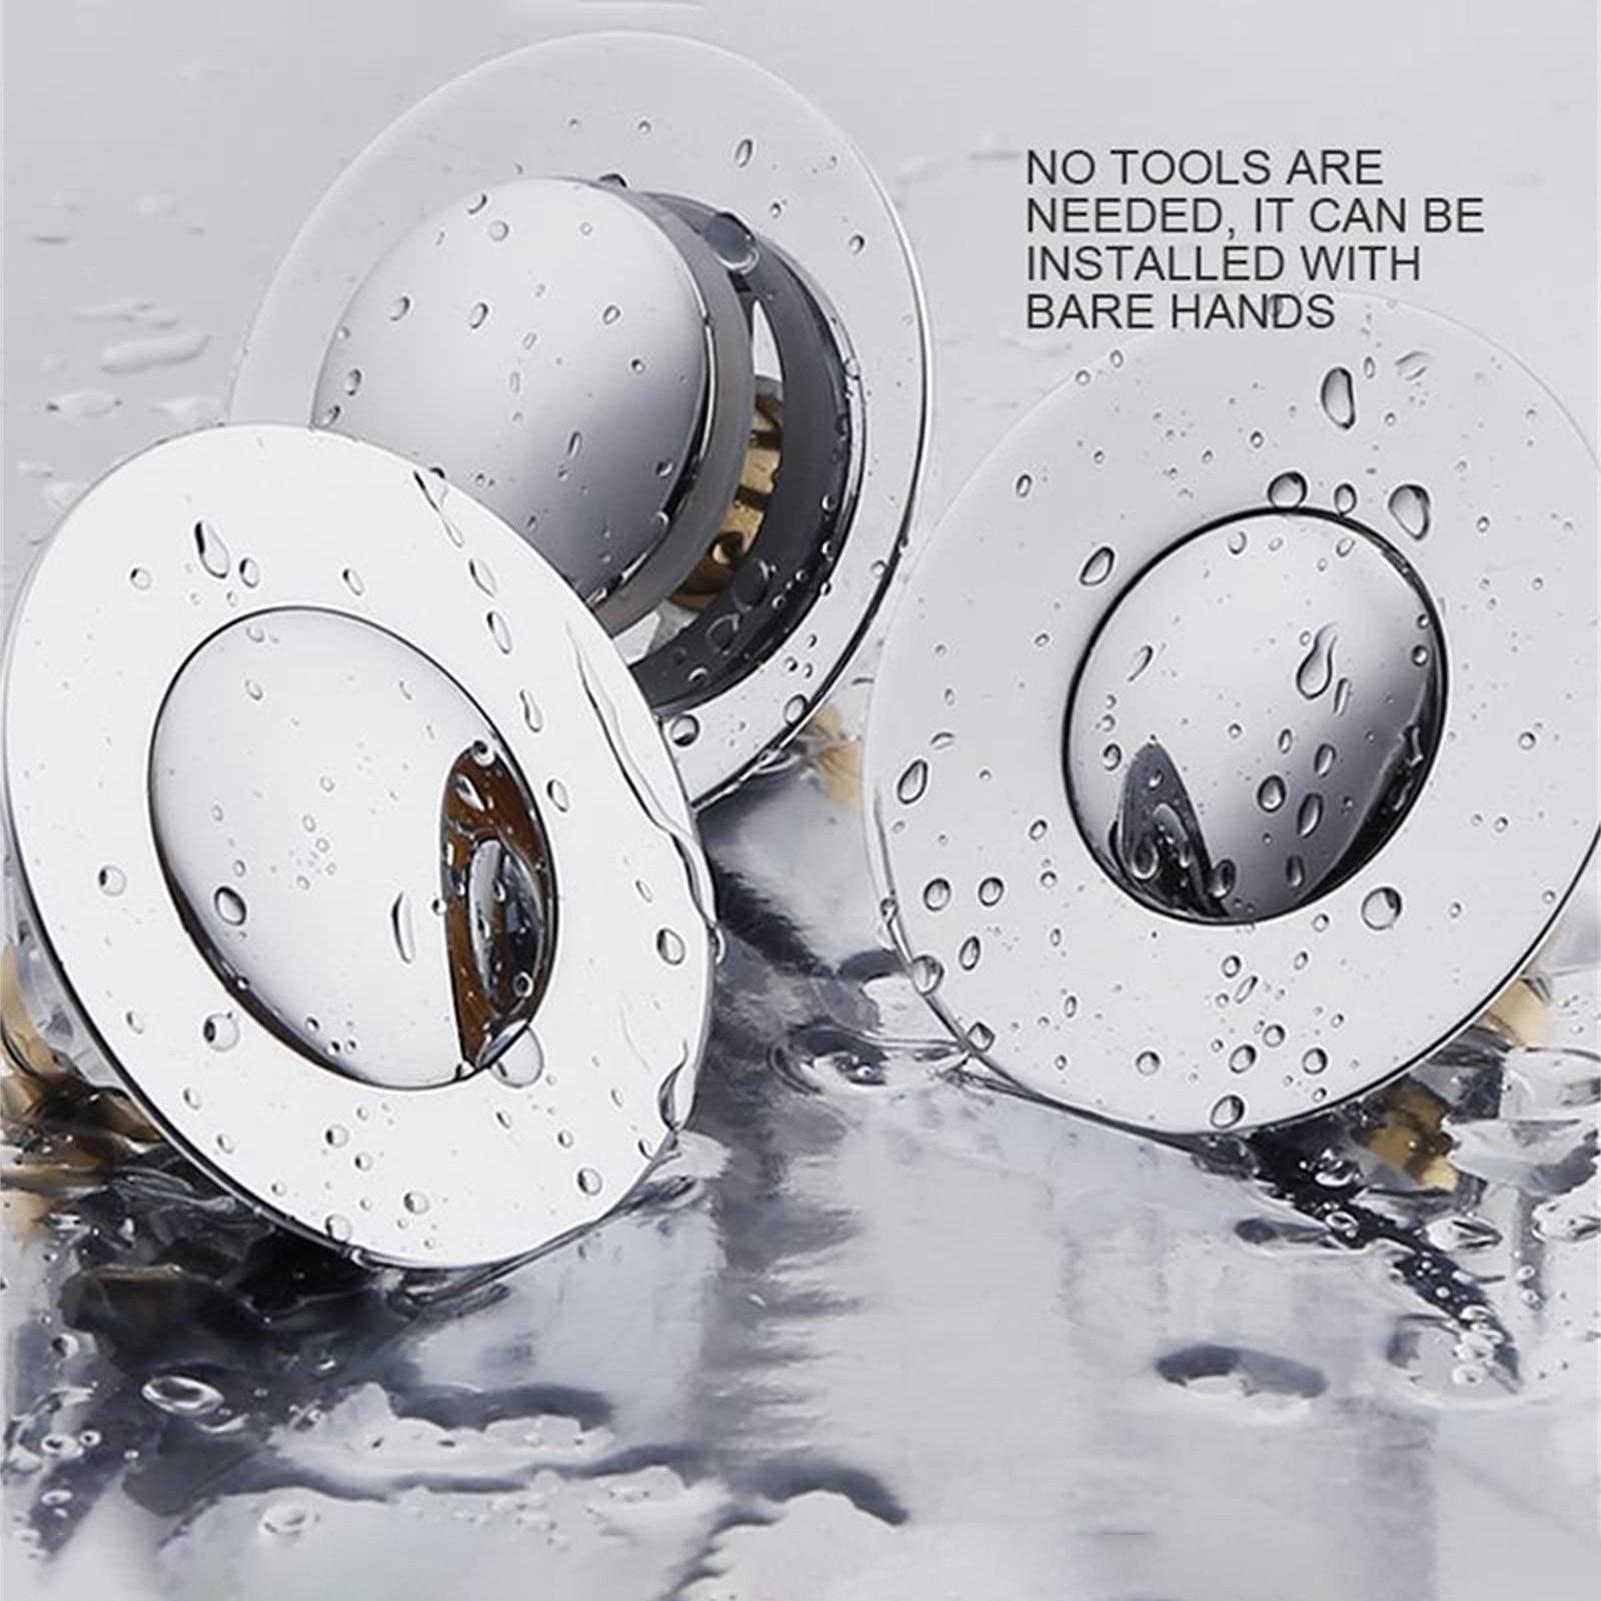 Universal Wash Basin Bounce Sink Drain Filter Vanity Stopper Up Drain Filter Bathroom Accessories Bathtub Plug Hair Catcher